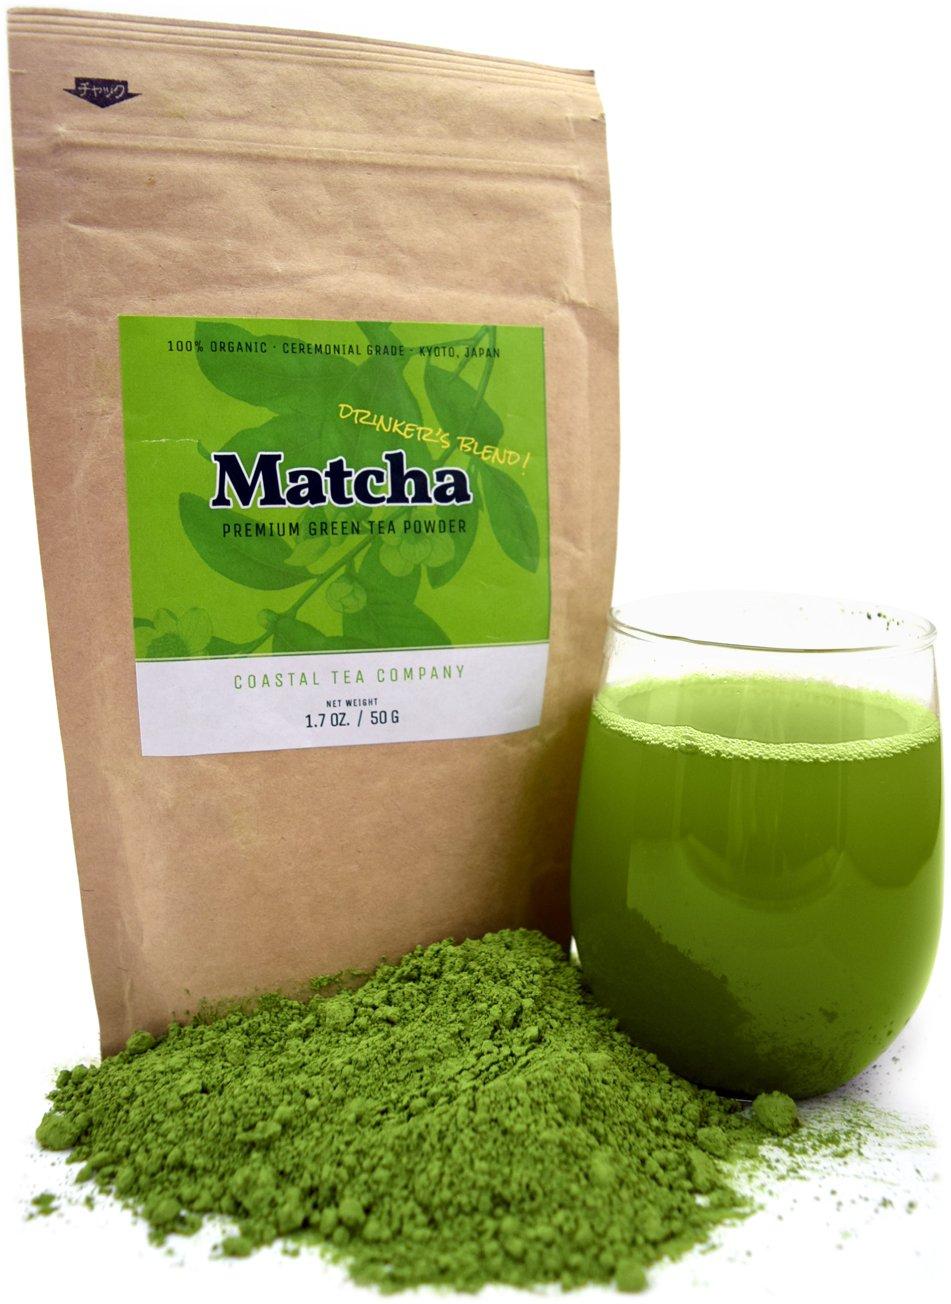 Coastal Tea Company Organic Ceremonial Matcha, Japanese Green Tea Powder, Drinking Grade, 1.7 Ounce